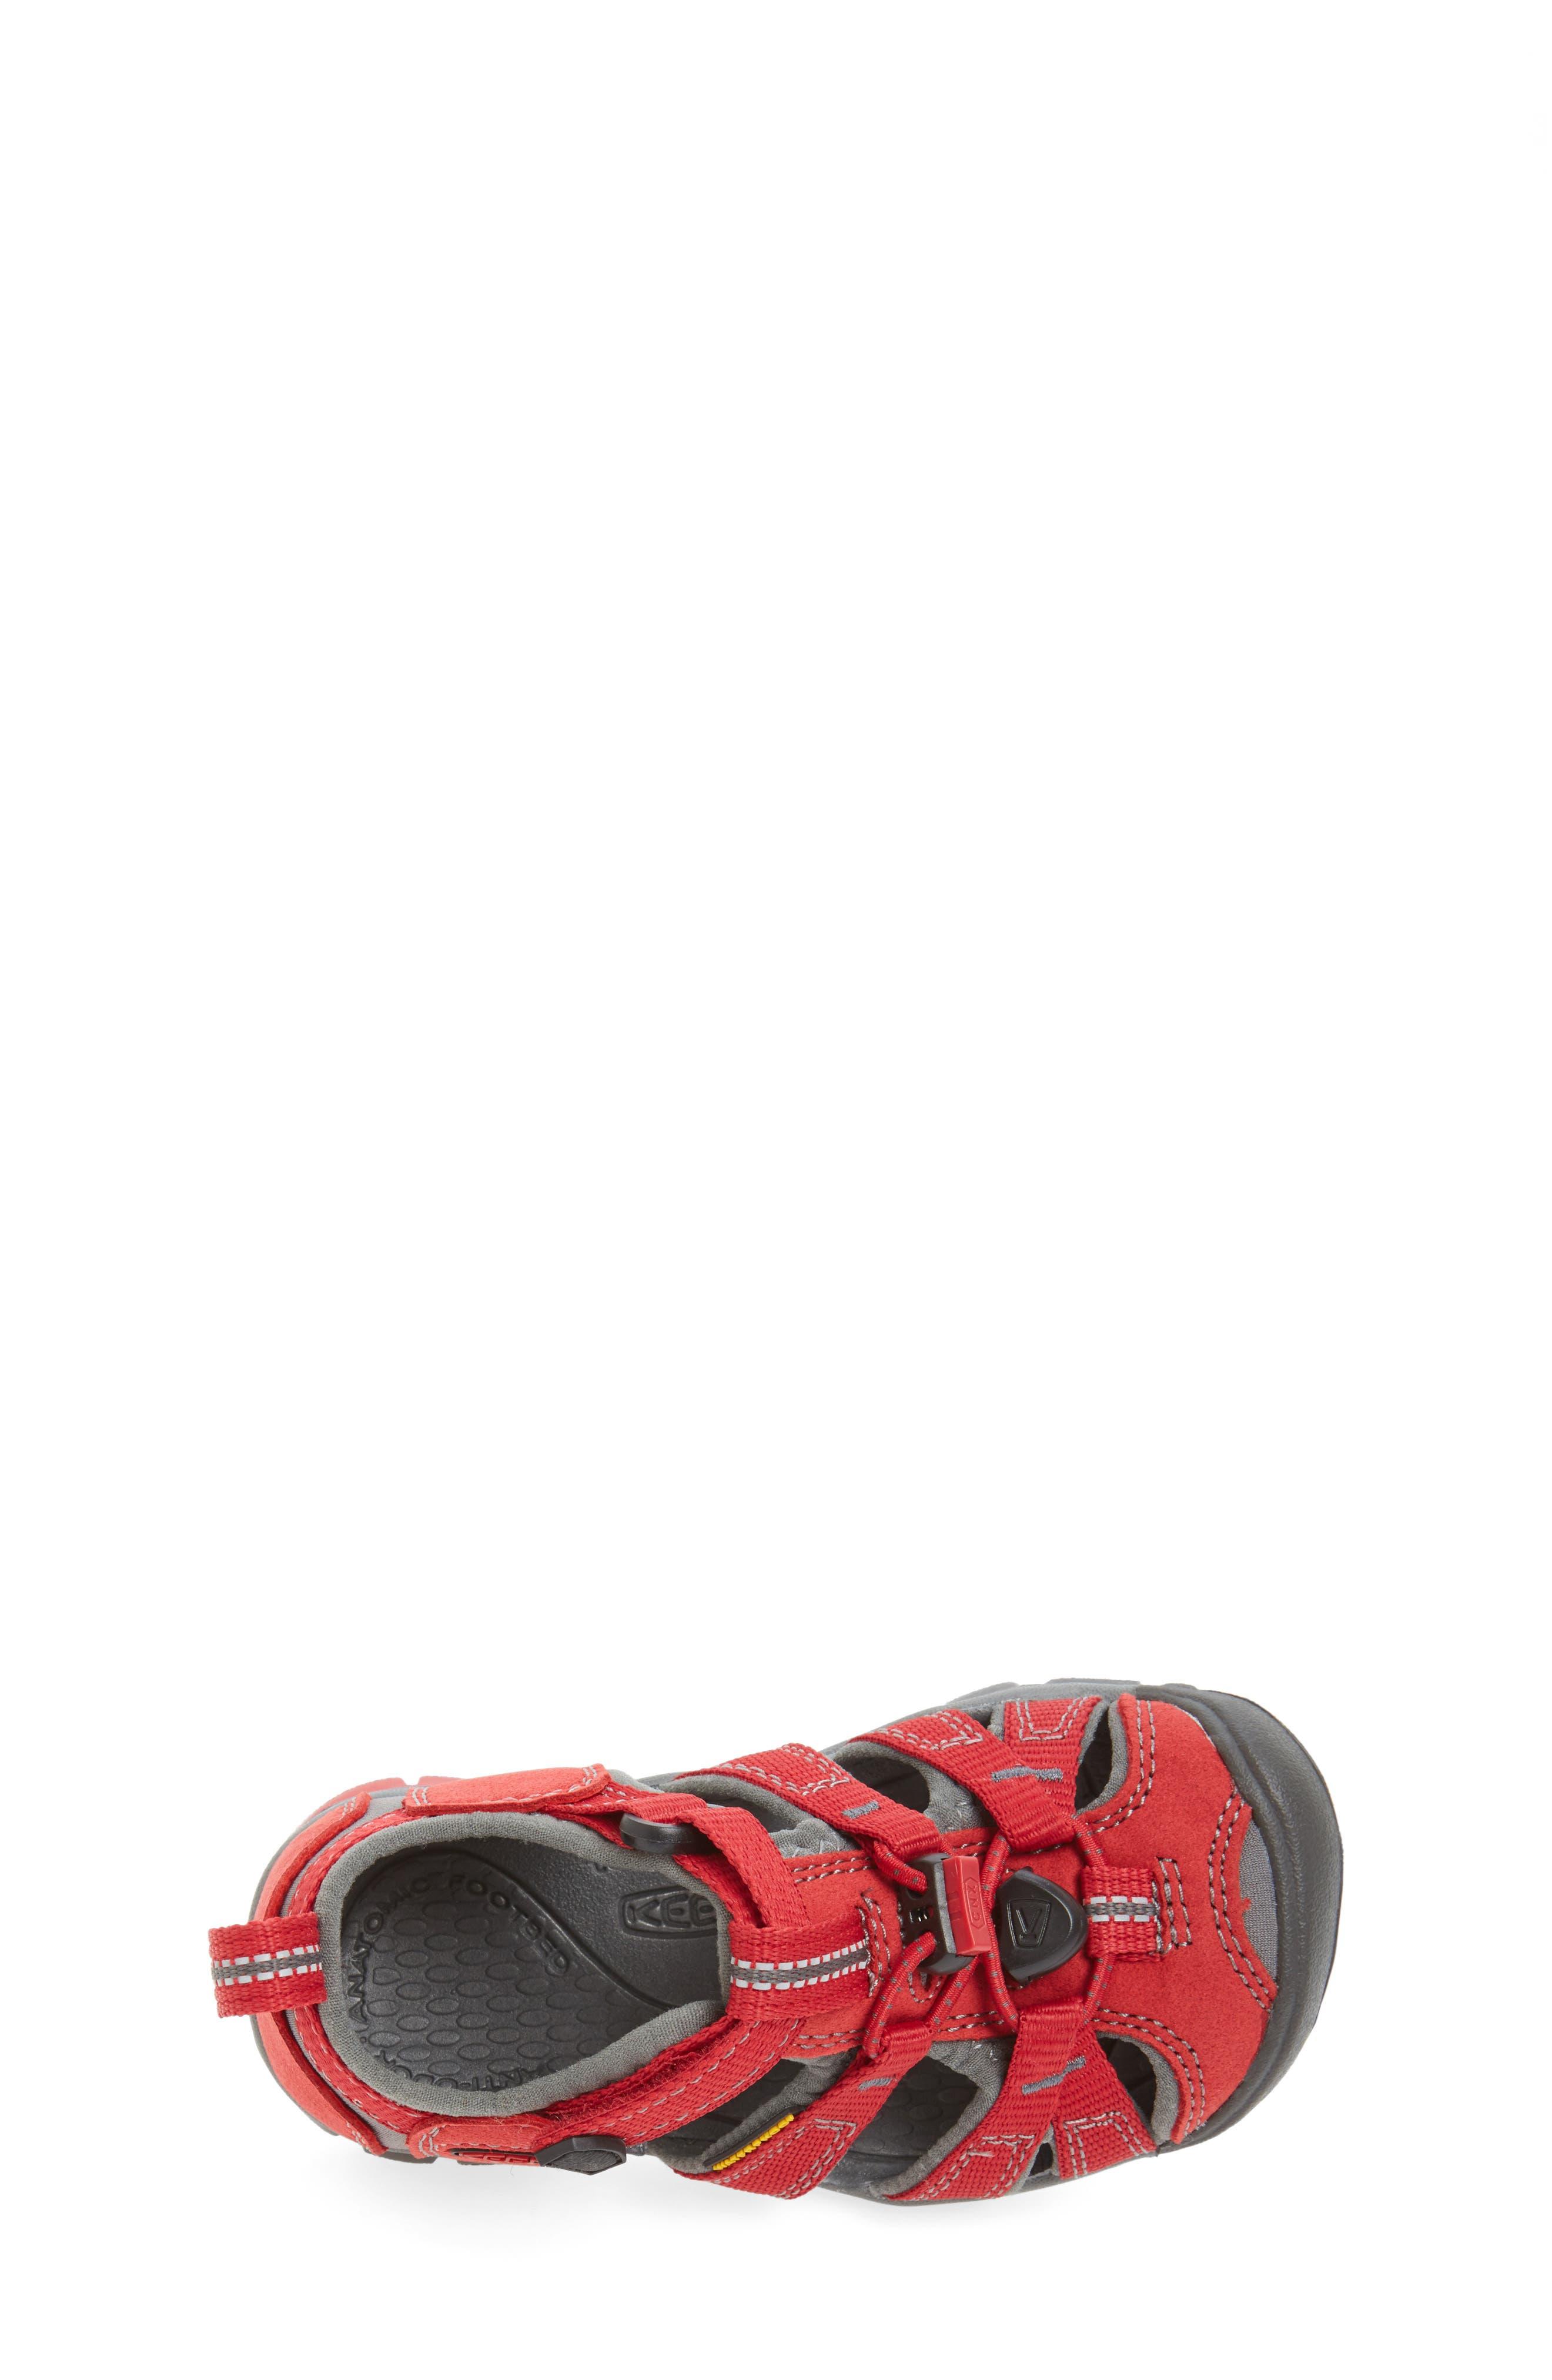 ,                             'Seacamp II' Water Friendly Sandal,                             Alternate thumbnail 245, color,                             616